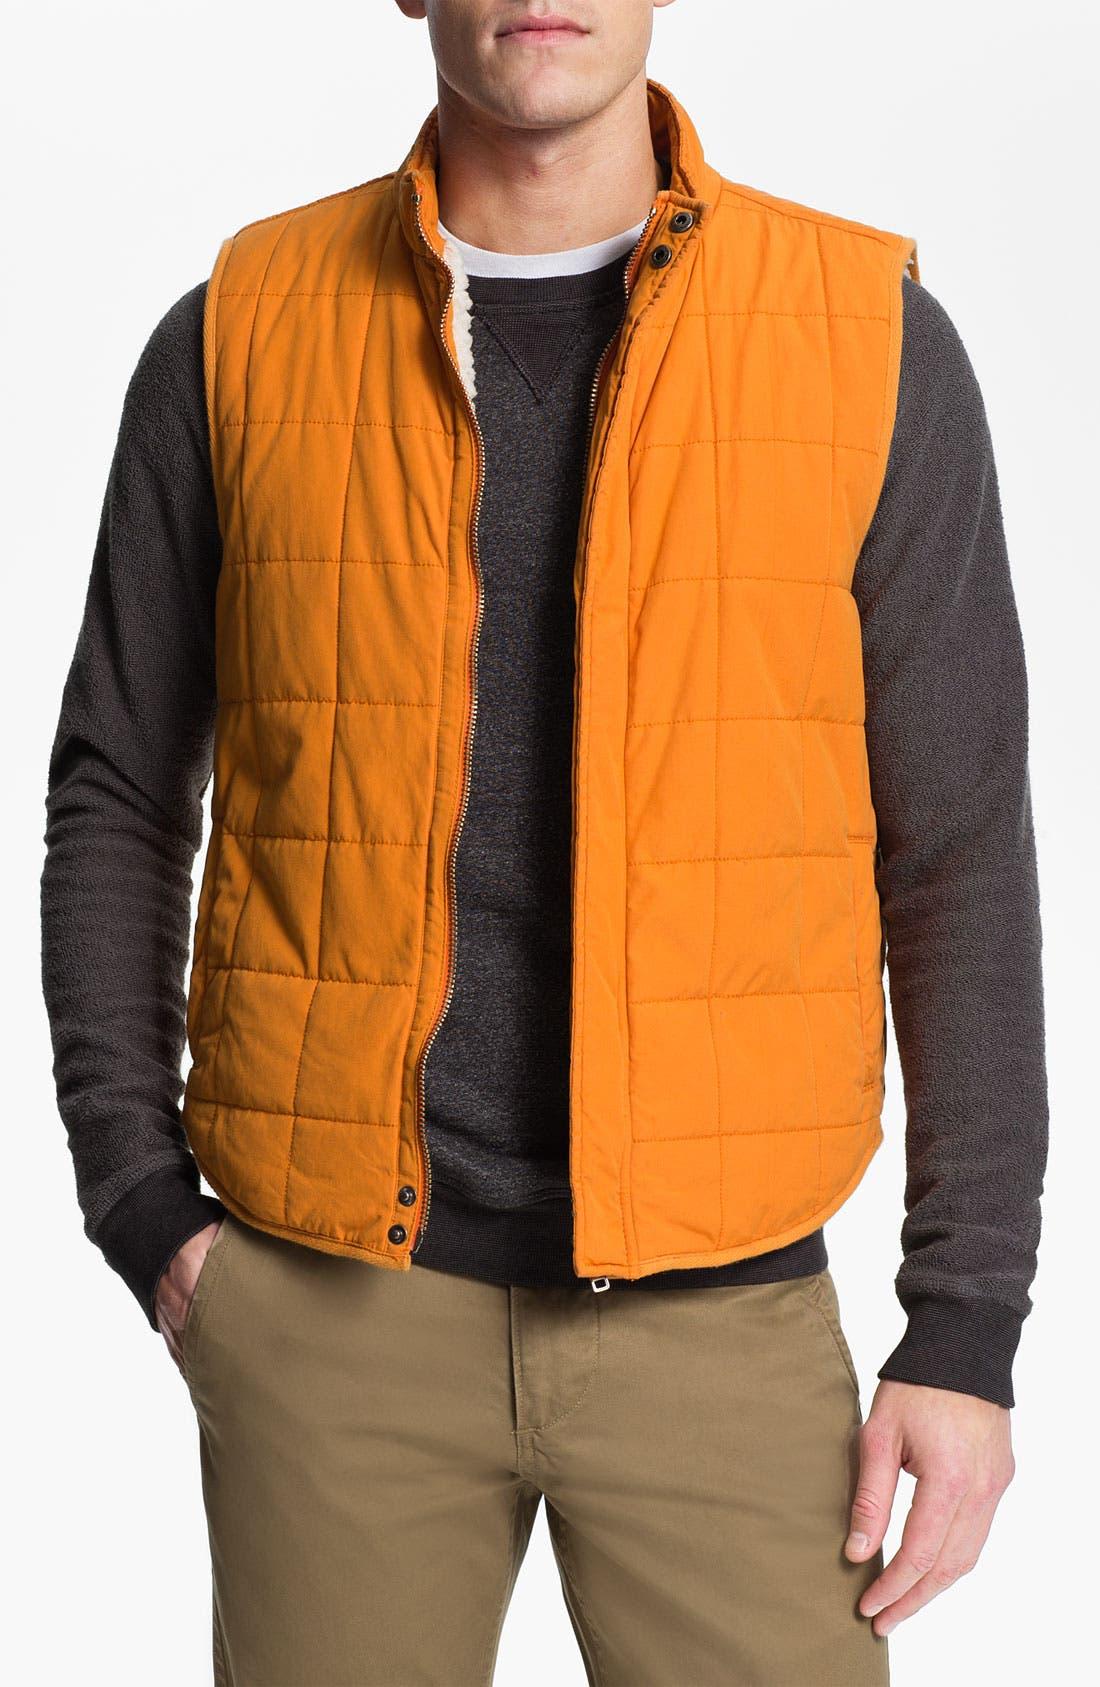 Alternate Image 1 Selected - Splendid Mills 'Wilson' Quilted Cotton Vest